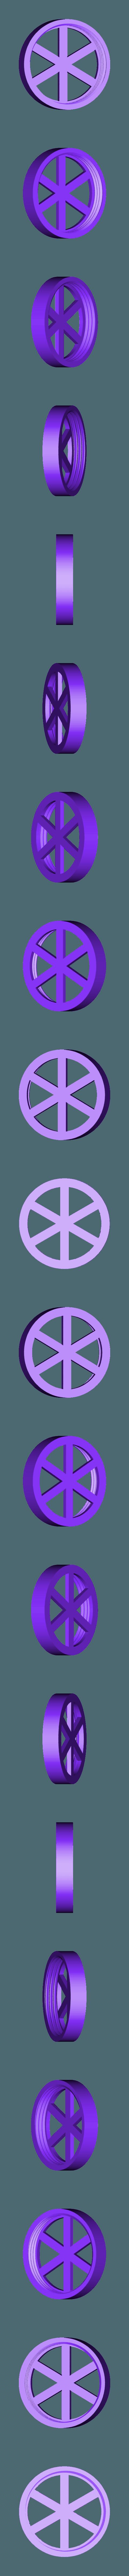 End_Cap_Lower_Inner.stl Download free STL file Two Air Pumps • 3D print object, gzumwalt